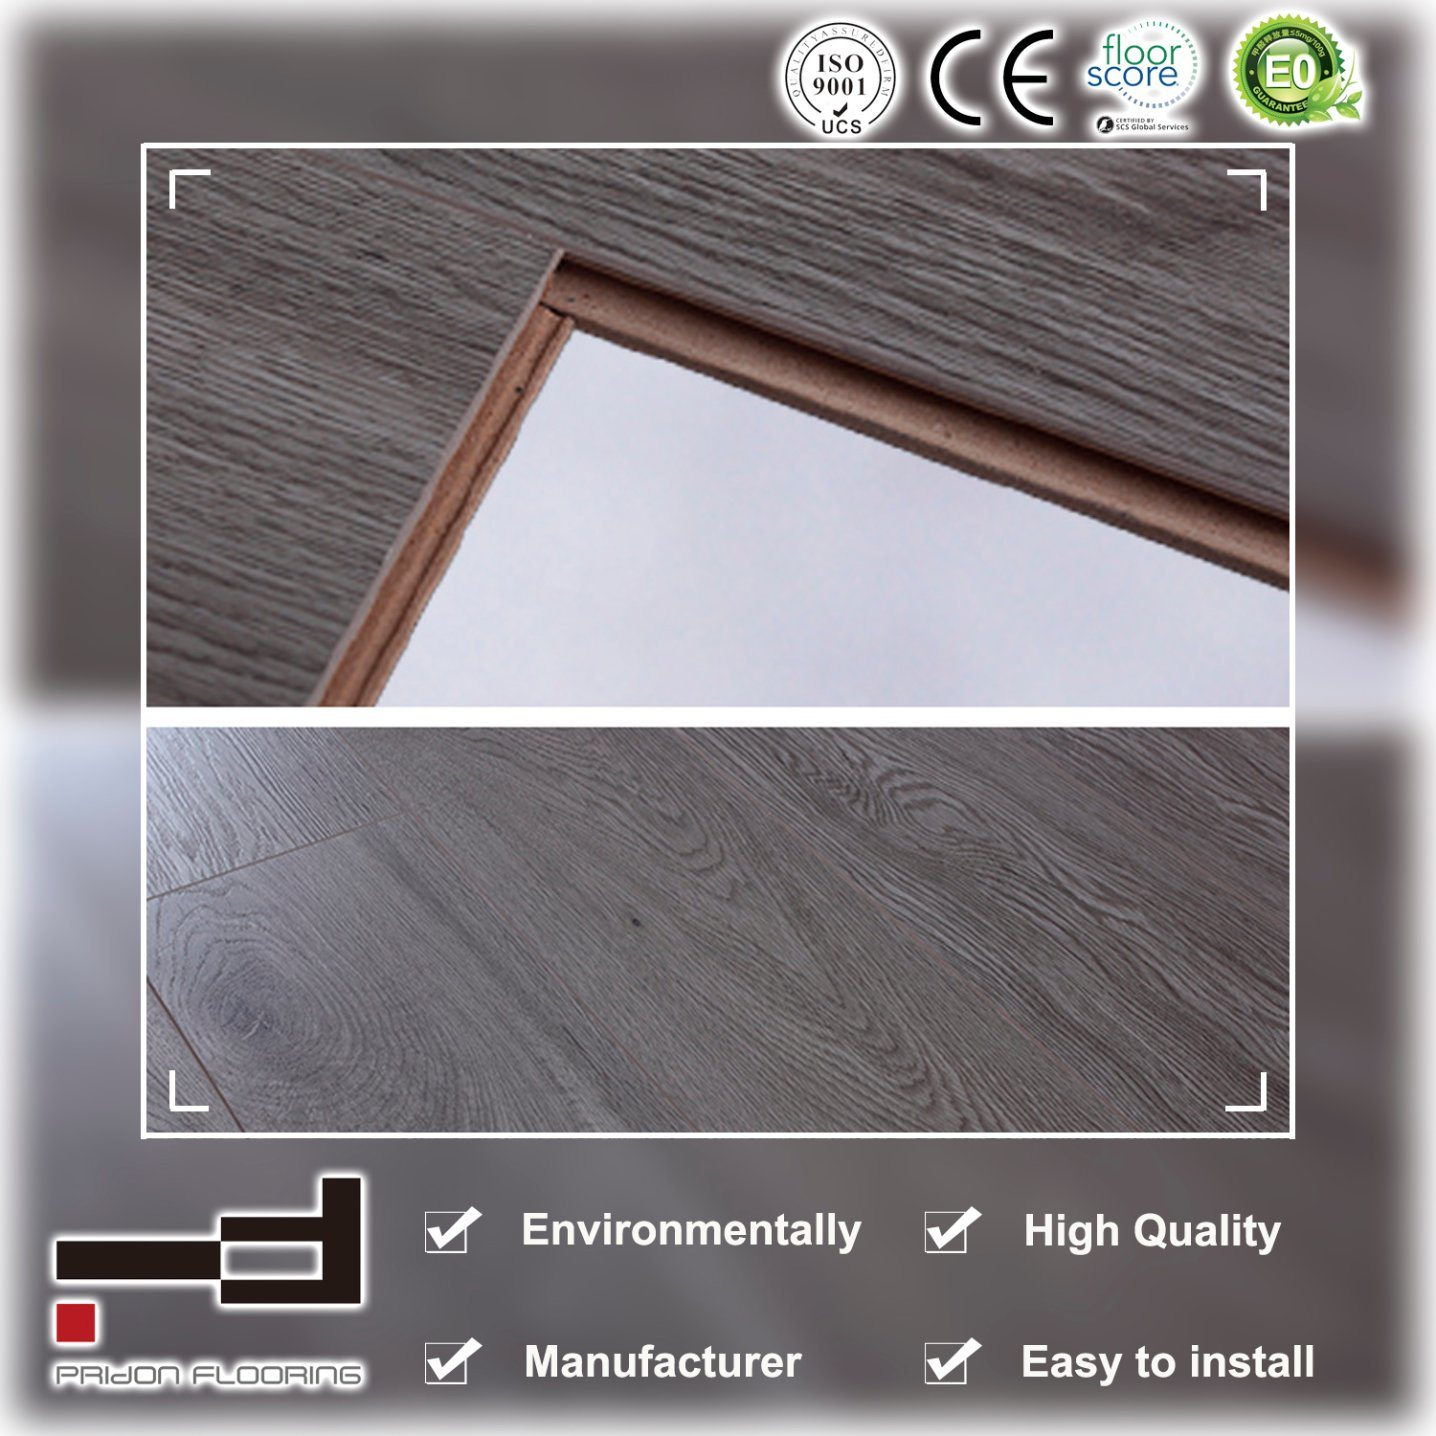 8mm 12mm Eir Light White Oak High Quality Drop Lock Laminate Flooring